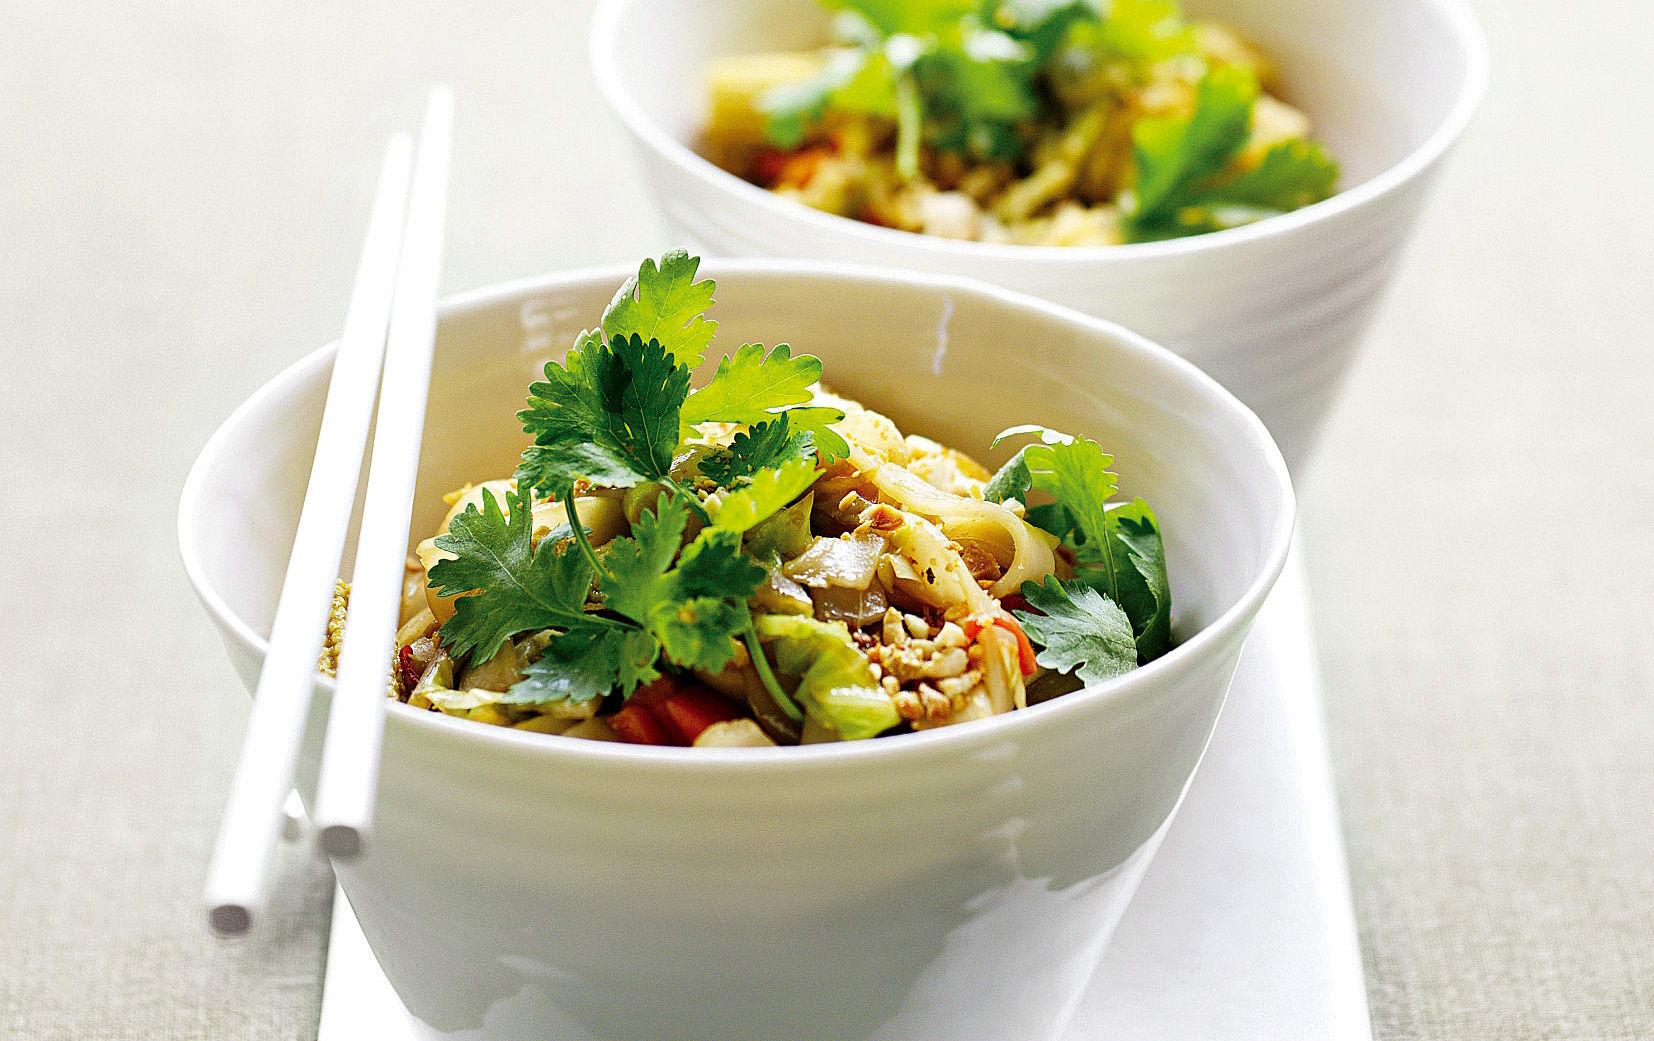 Asian market noodles image 1